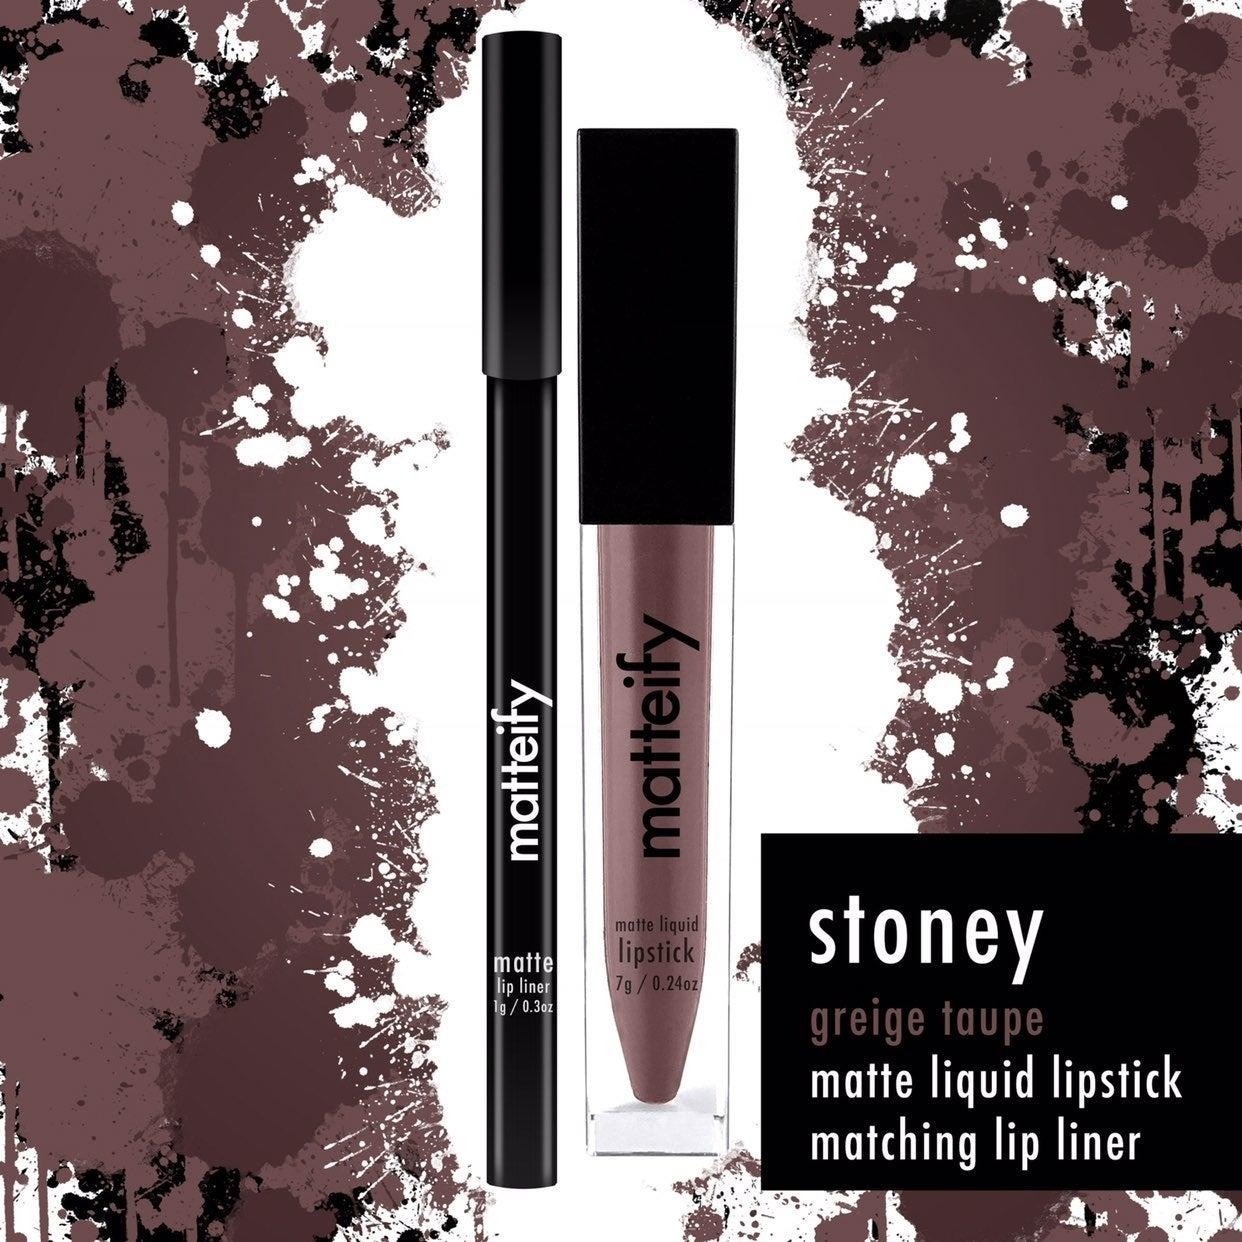 Matte liquid lipstick and lip liner kit